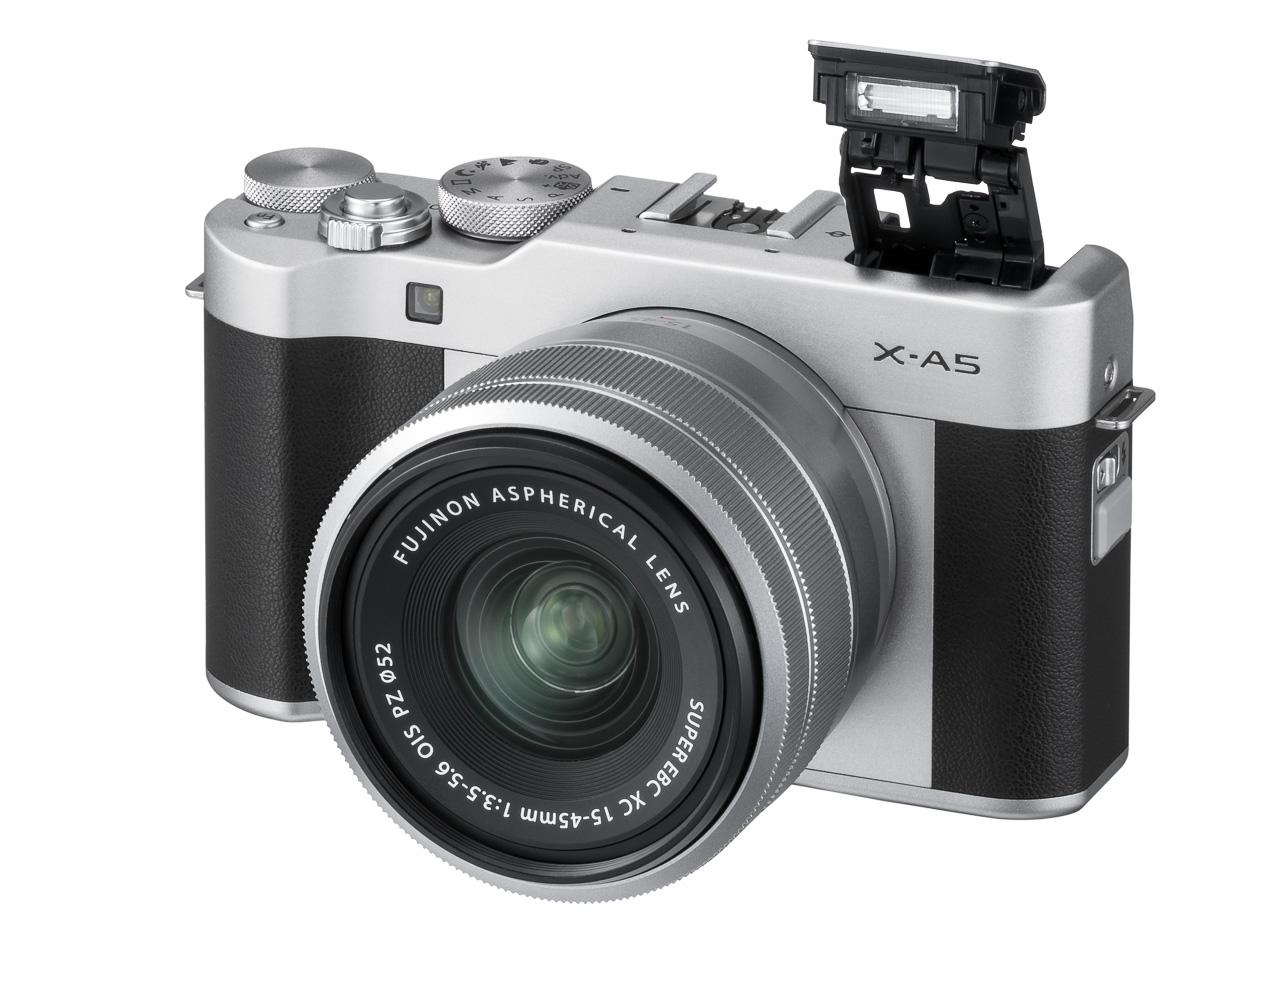 X-A5_Silver_FrontOblique_Flash_XC15-45mm_03_Titel